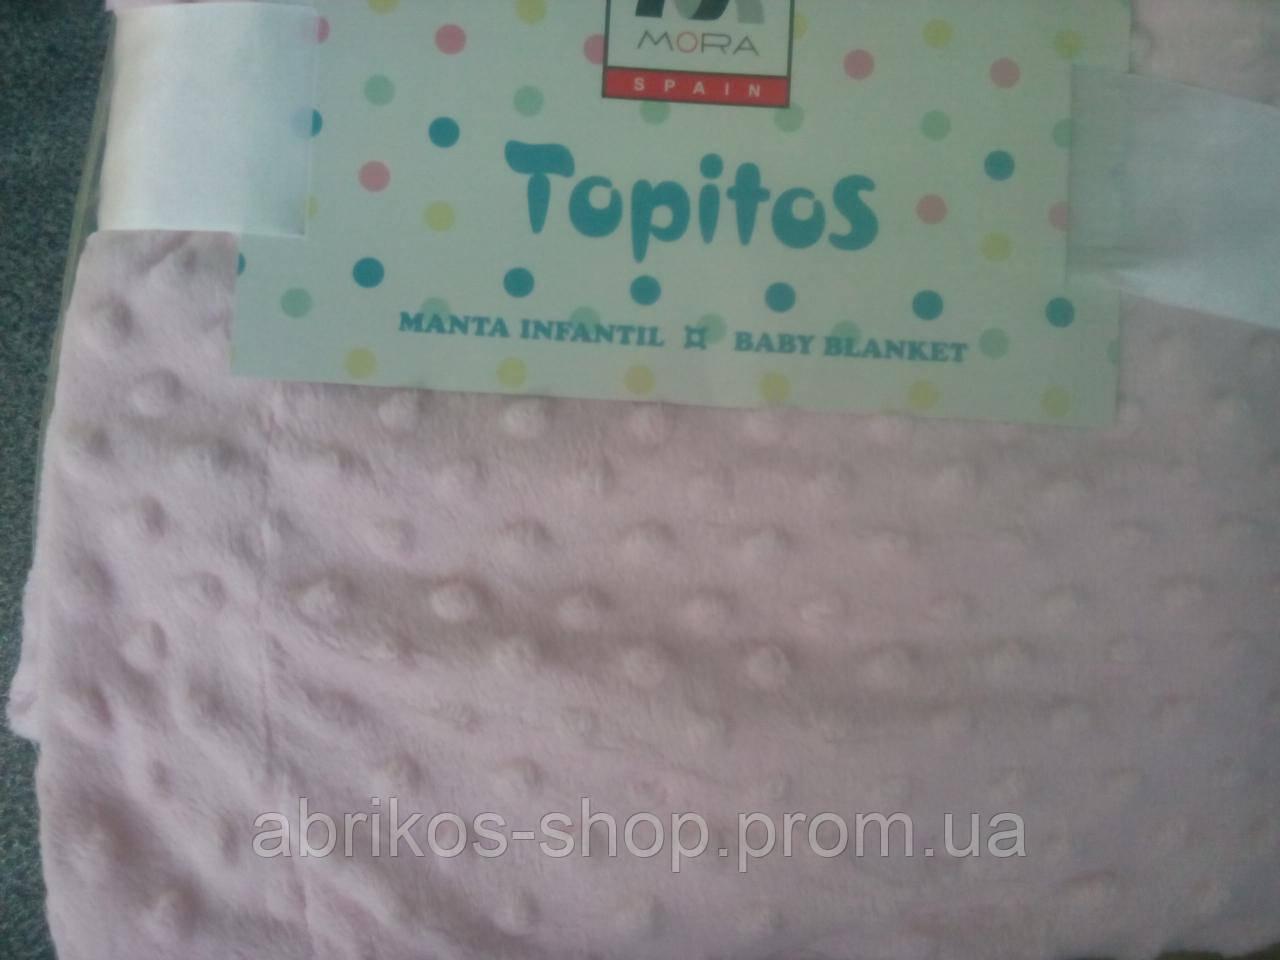 Детское одеяло - плед  Topitos   ( Испания )